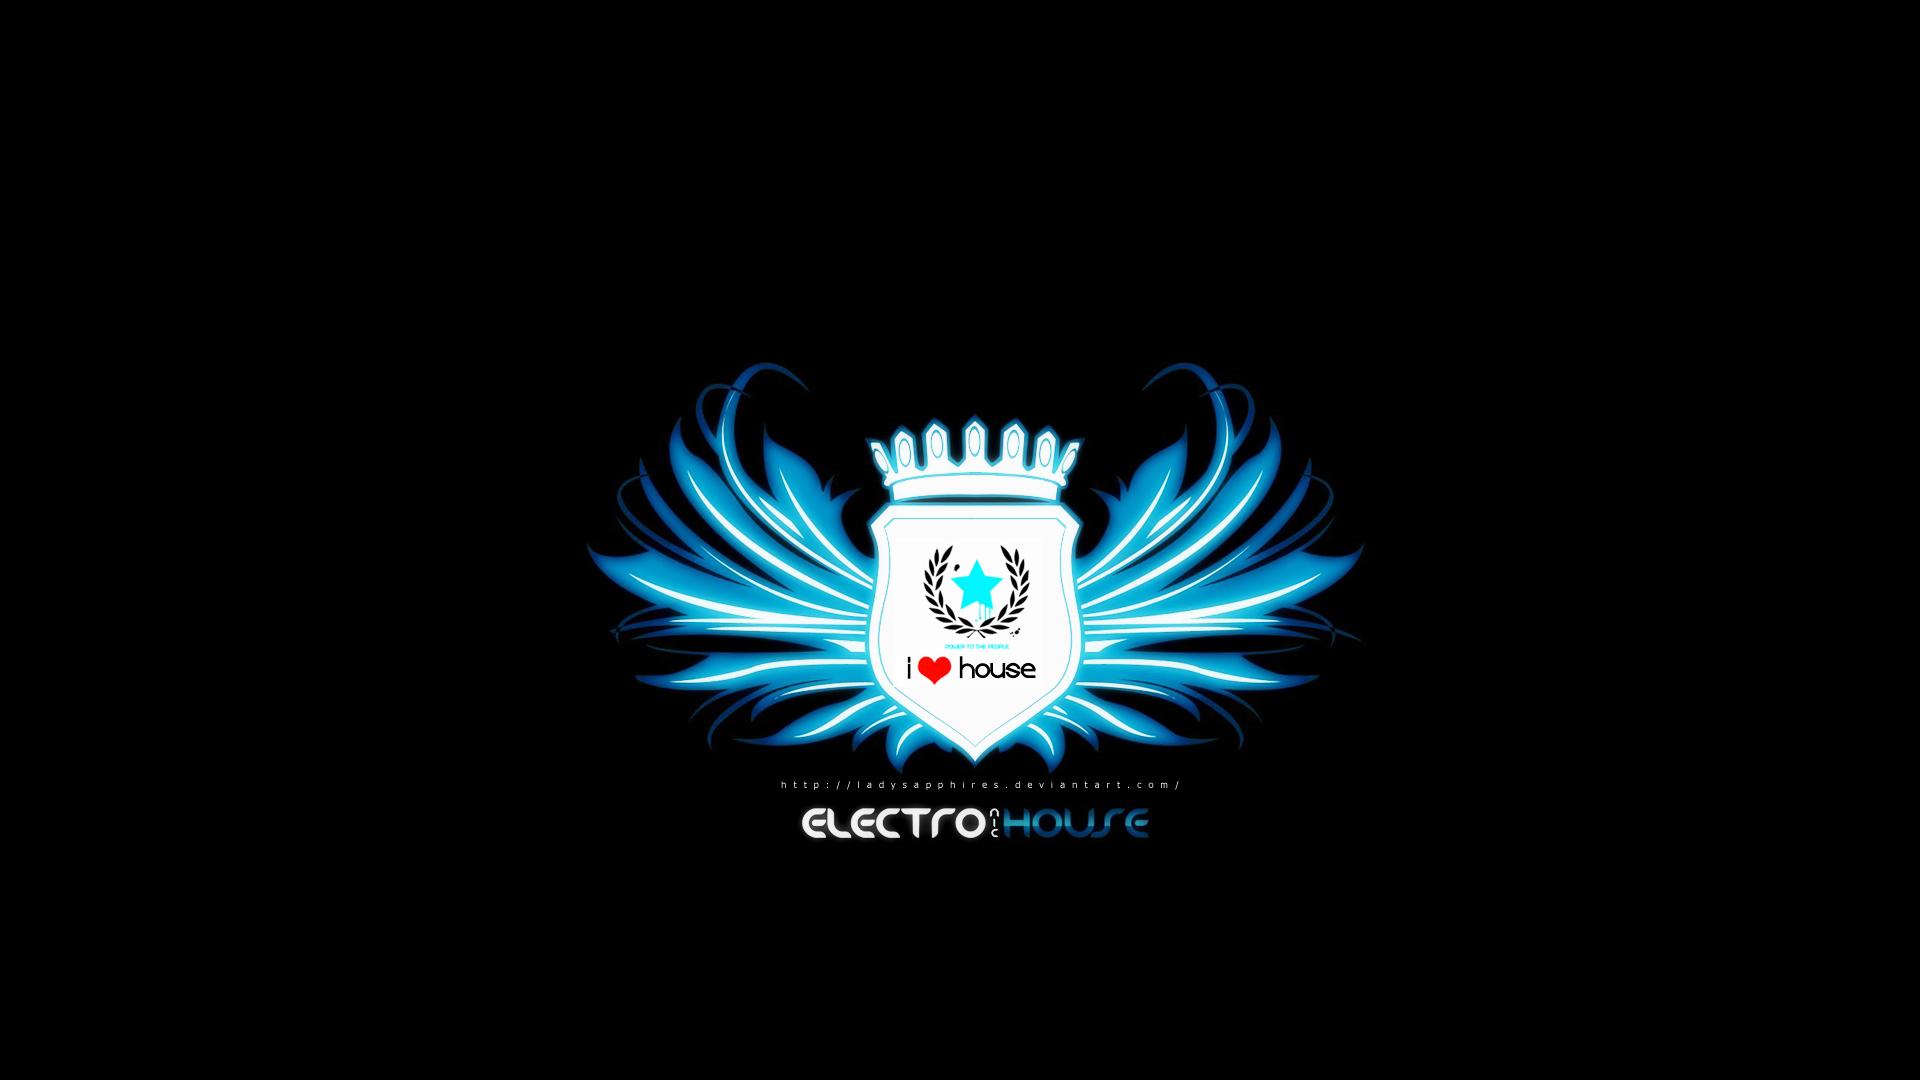 Electro house music wallpaper wallpapersafari for 93 house music